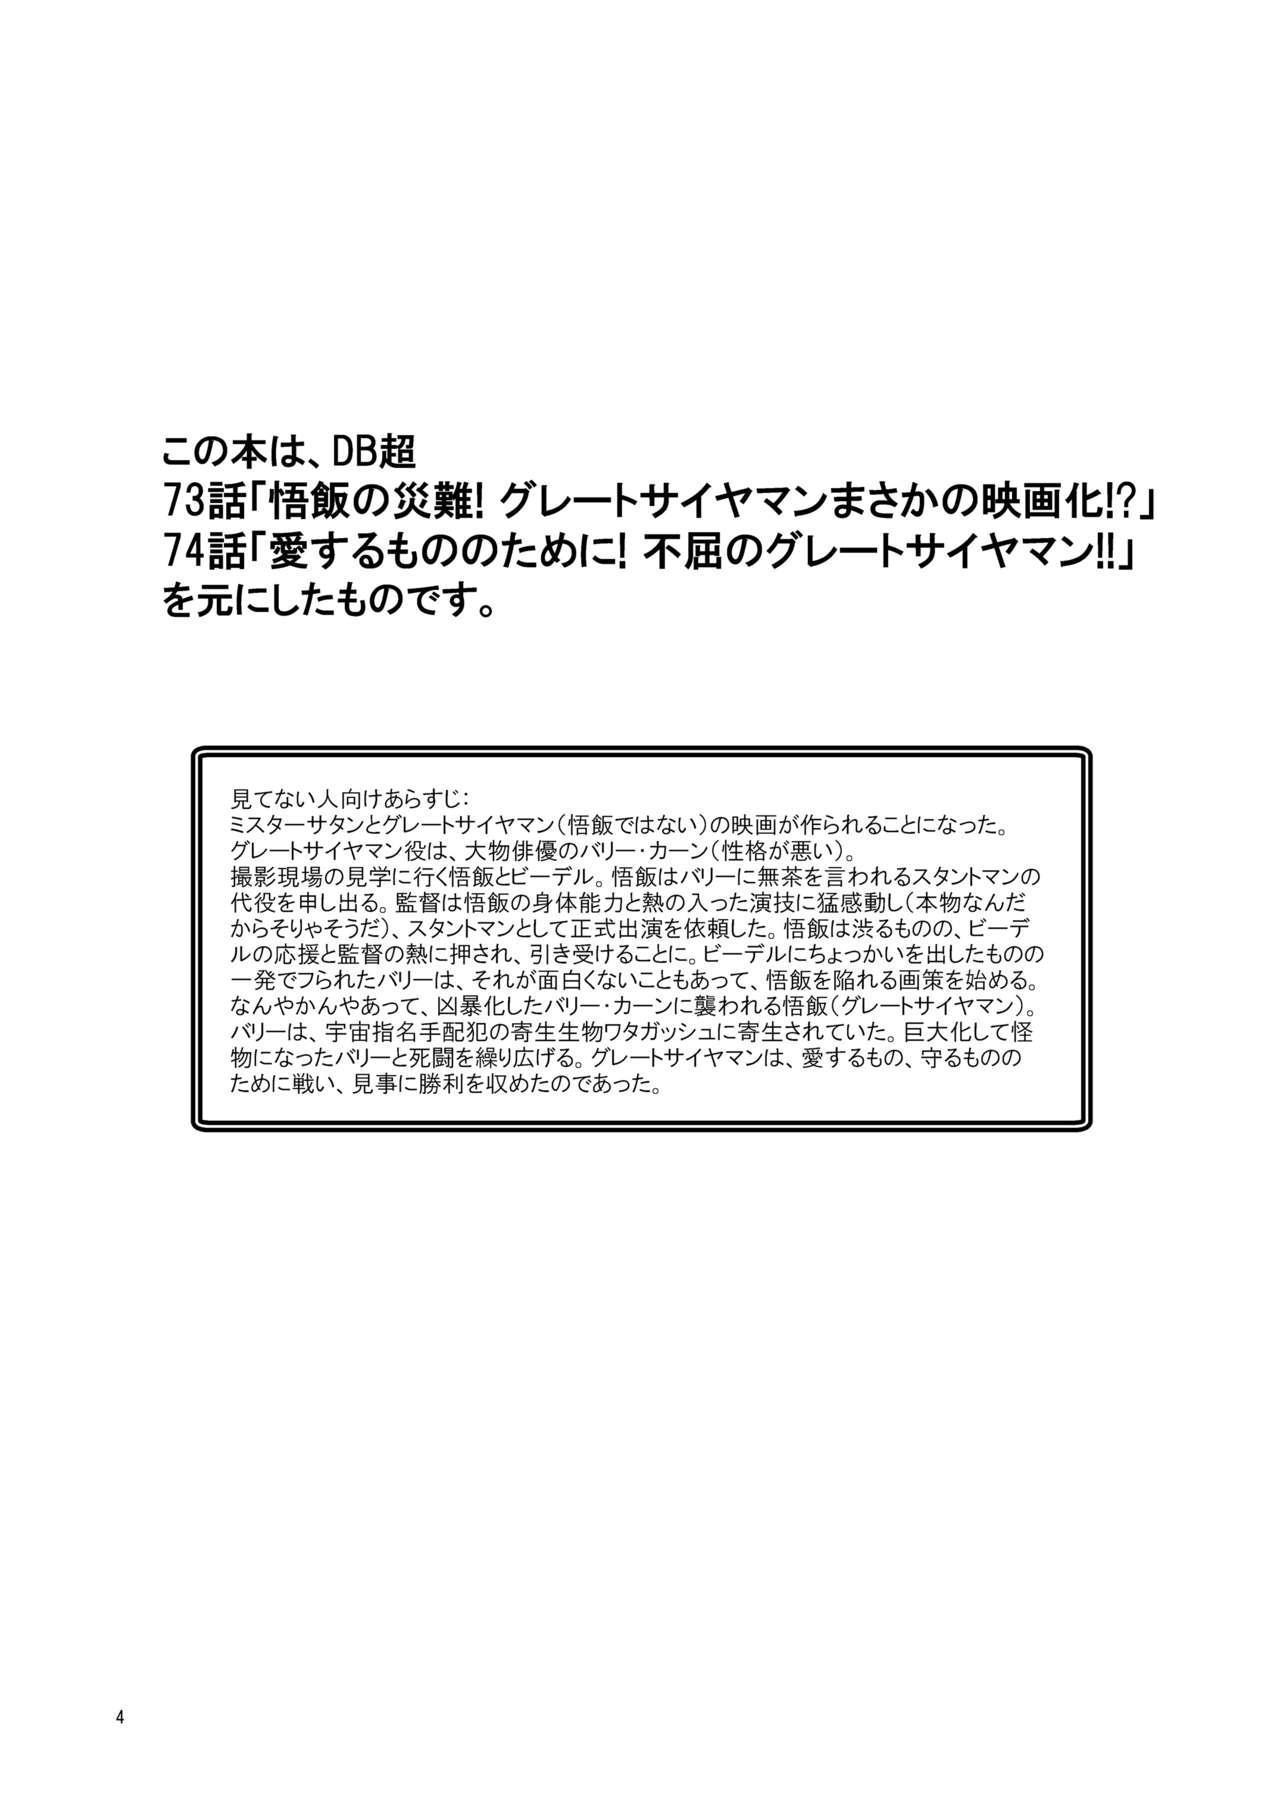 Great Saiyaman vs Shokushu Kaijin 3